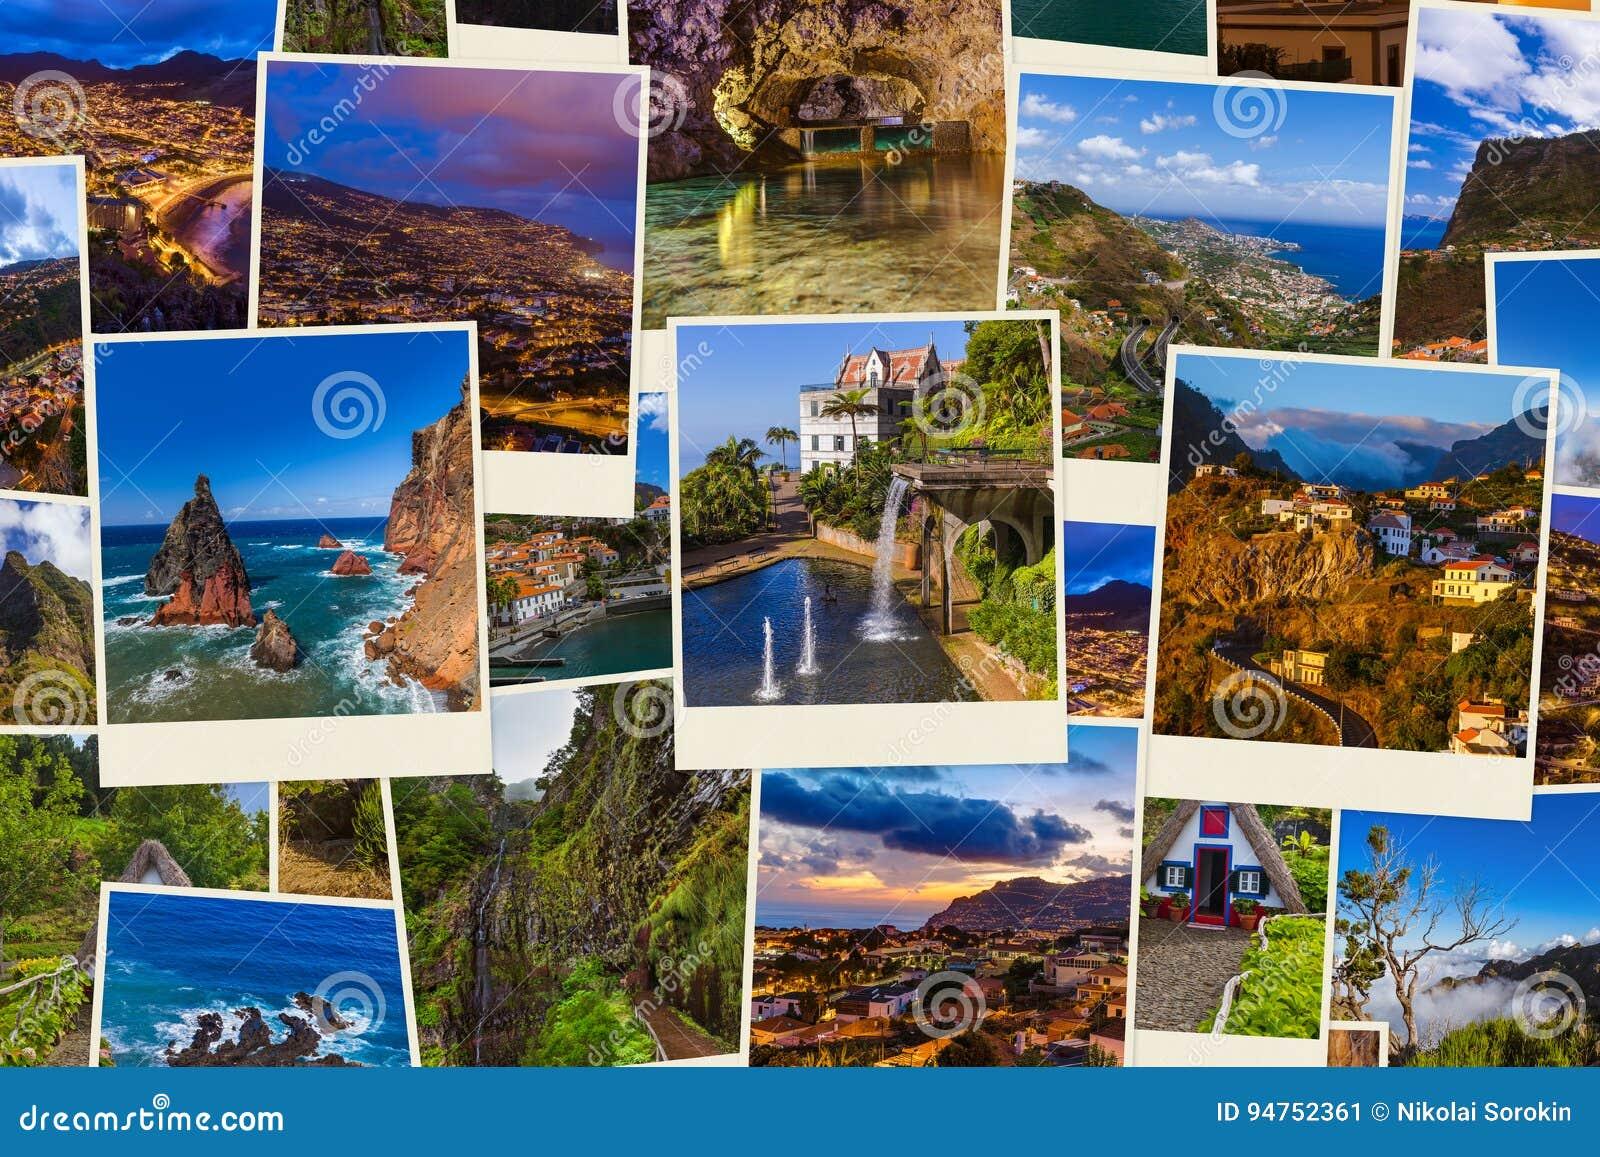 Madeira Island Portugal Travel Images My Photos Stock Image Image